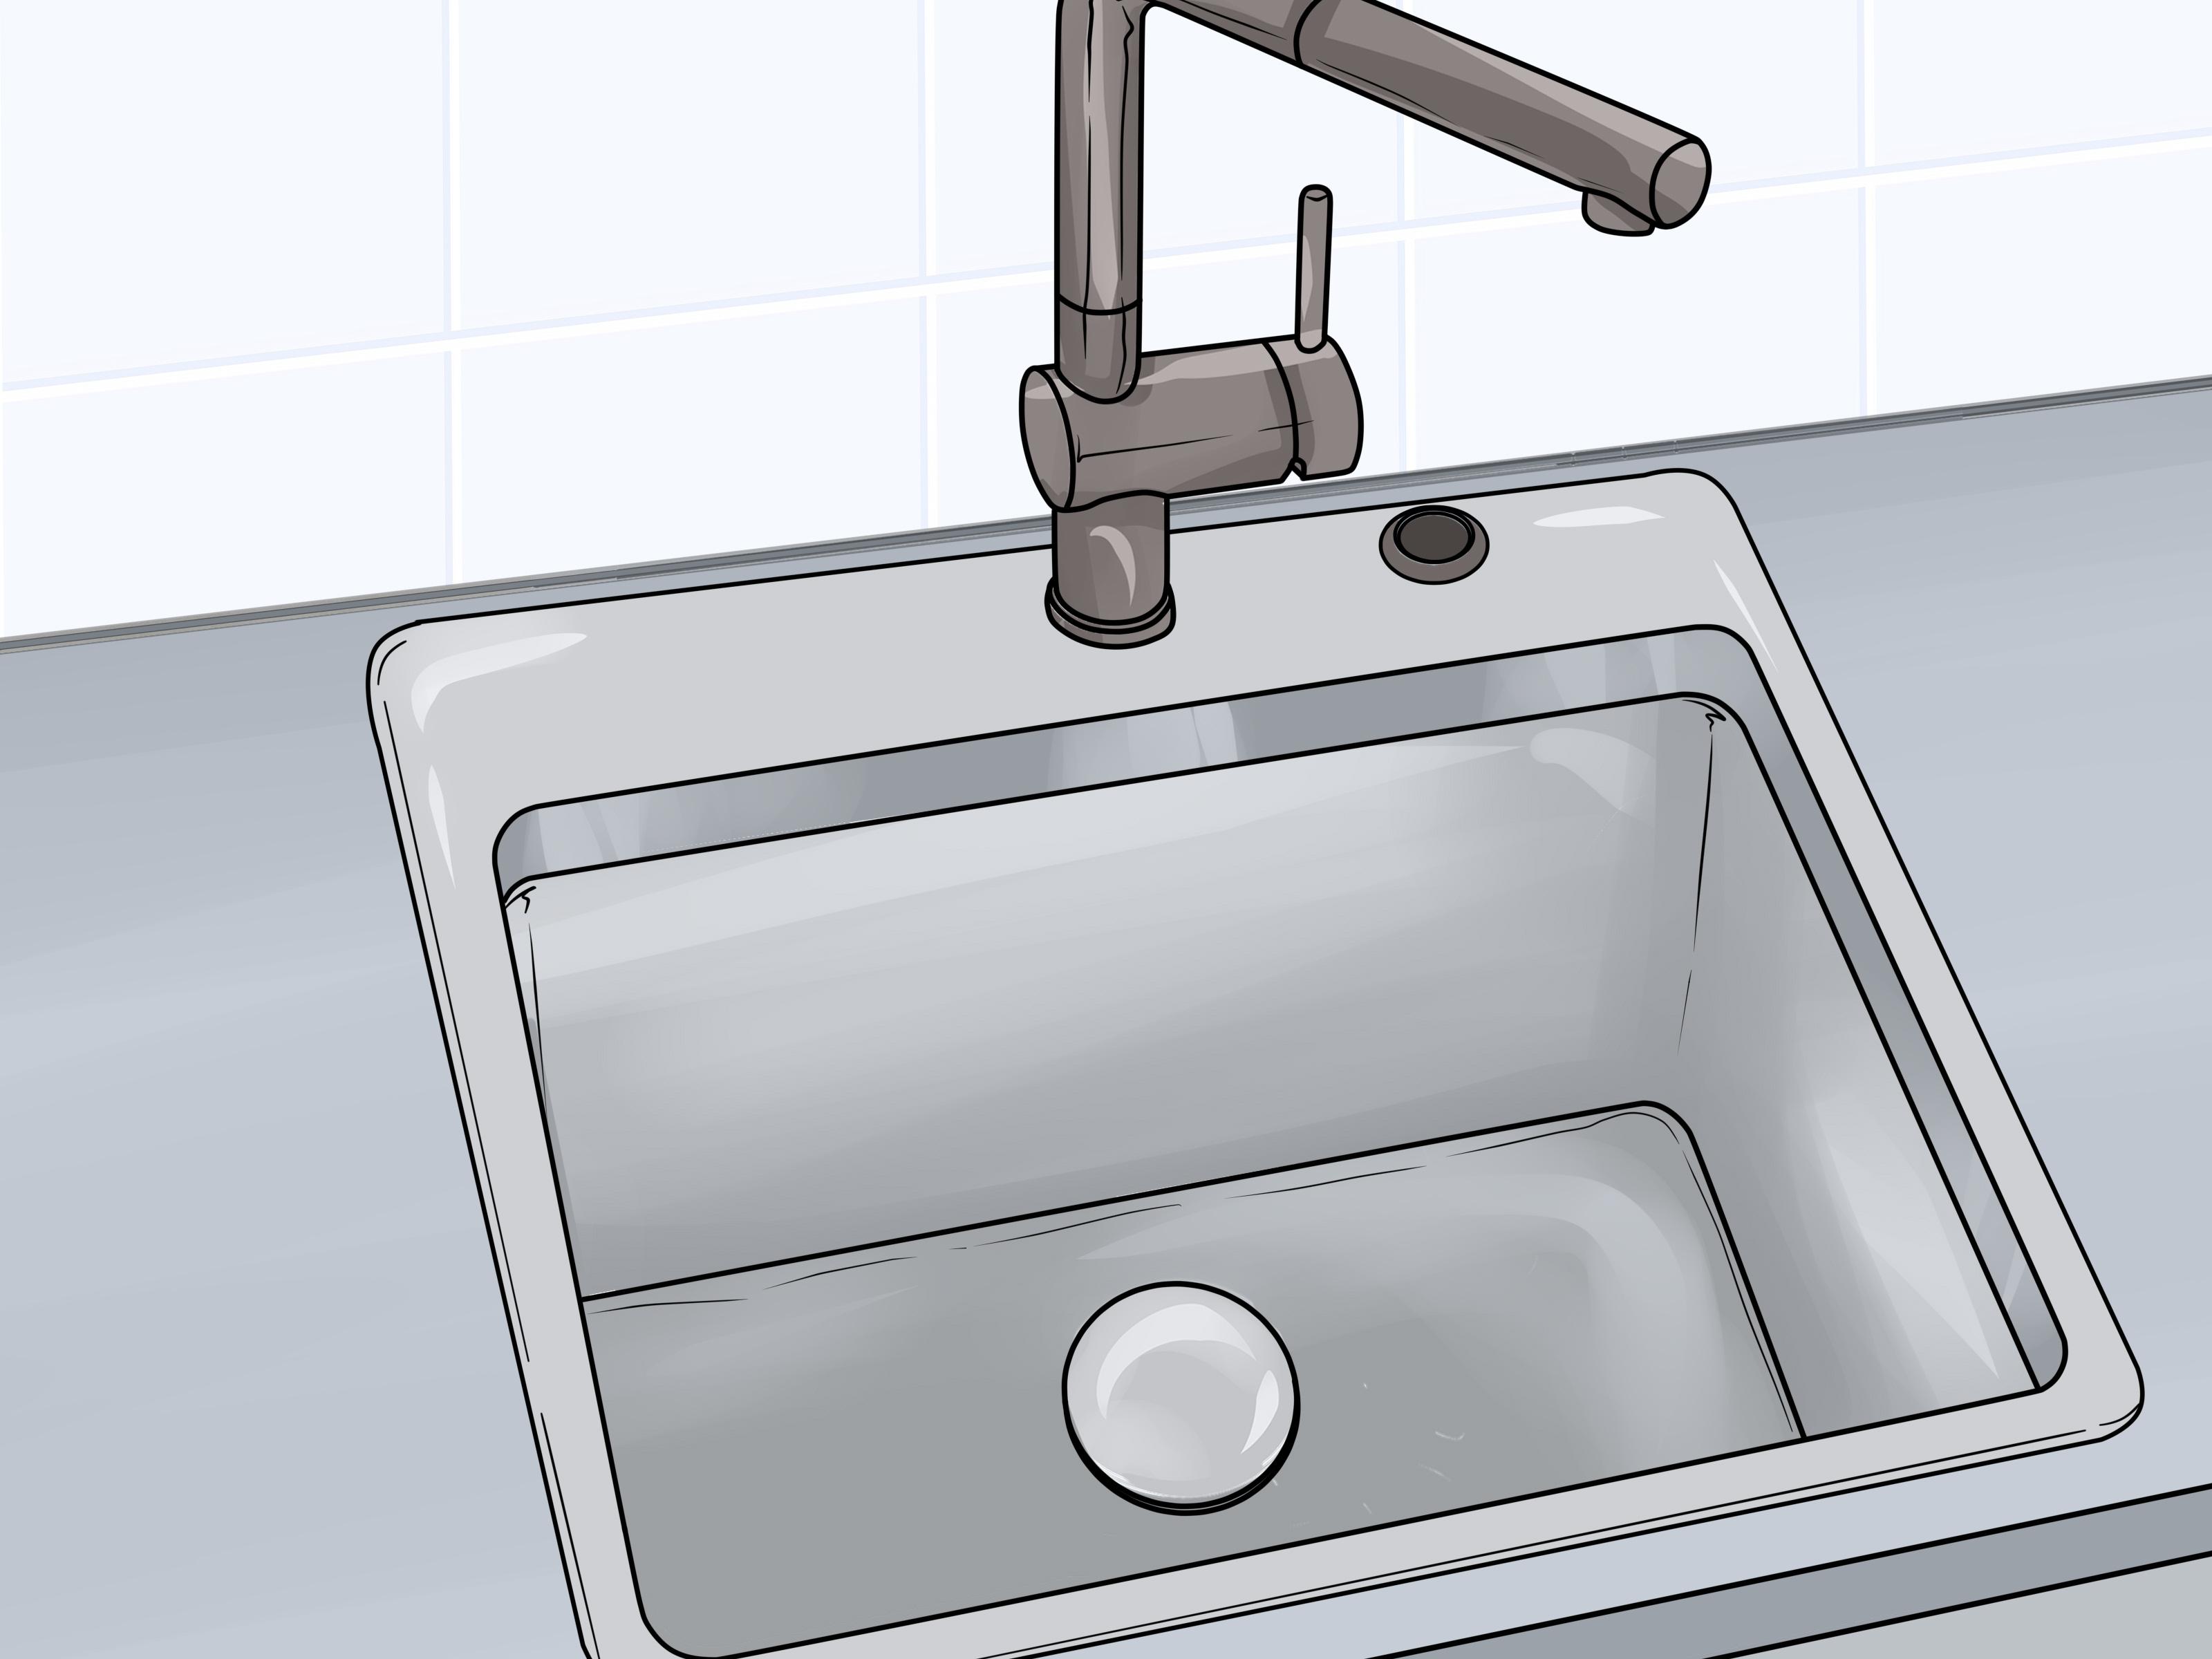 4 ways to fix your kitchen sink wikihow